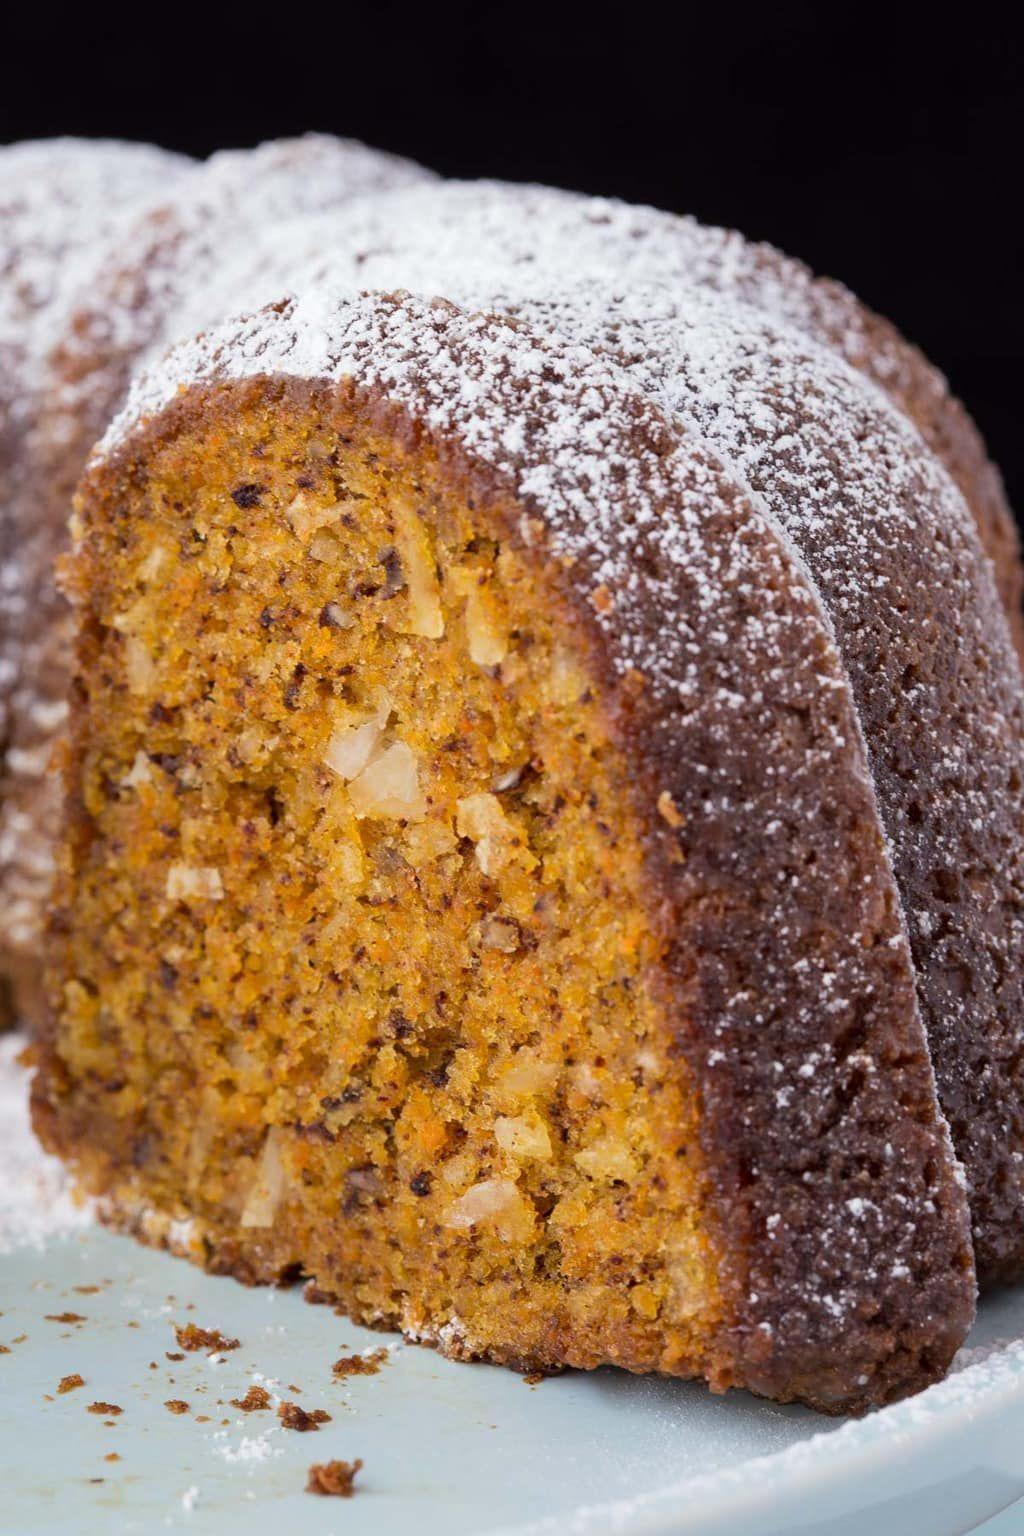 Easy Carrot Cake With Buttermilk Glaze Recipe Easy Carrot Cake Food Processor Recipes Carrot Cake